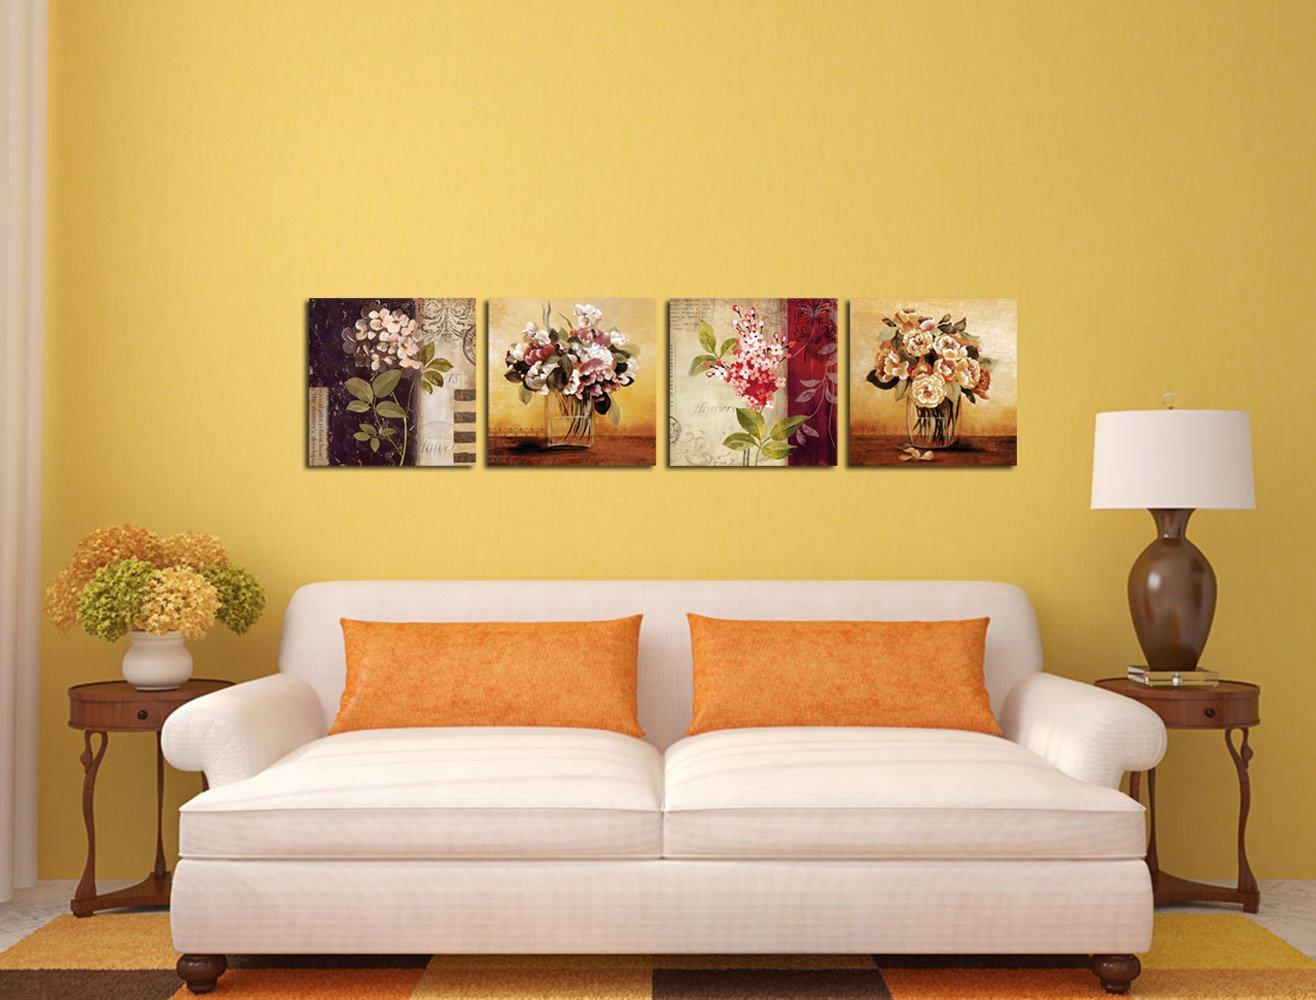 Amazon.com: Gardenia - Retro Flowers Canvas Wall Art Prints 16 x 16 ...